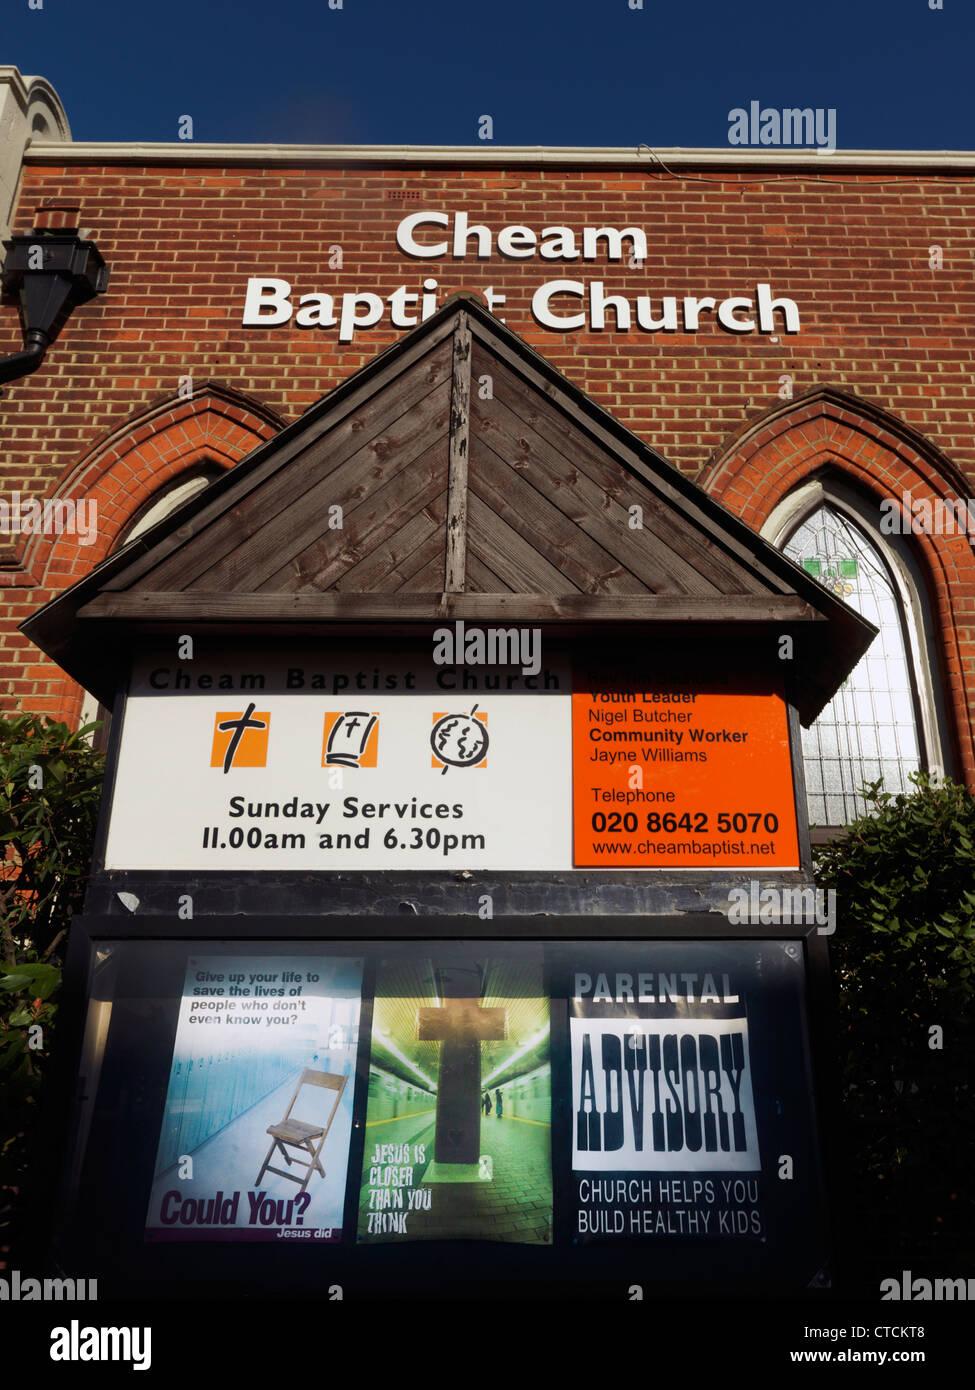 Church Noticeboard Outside Cheam Baptist Church Surrey England - Stock Image